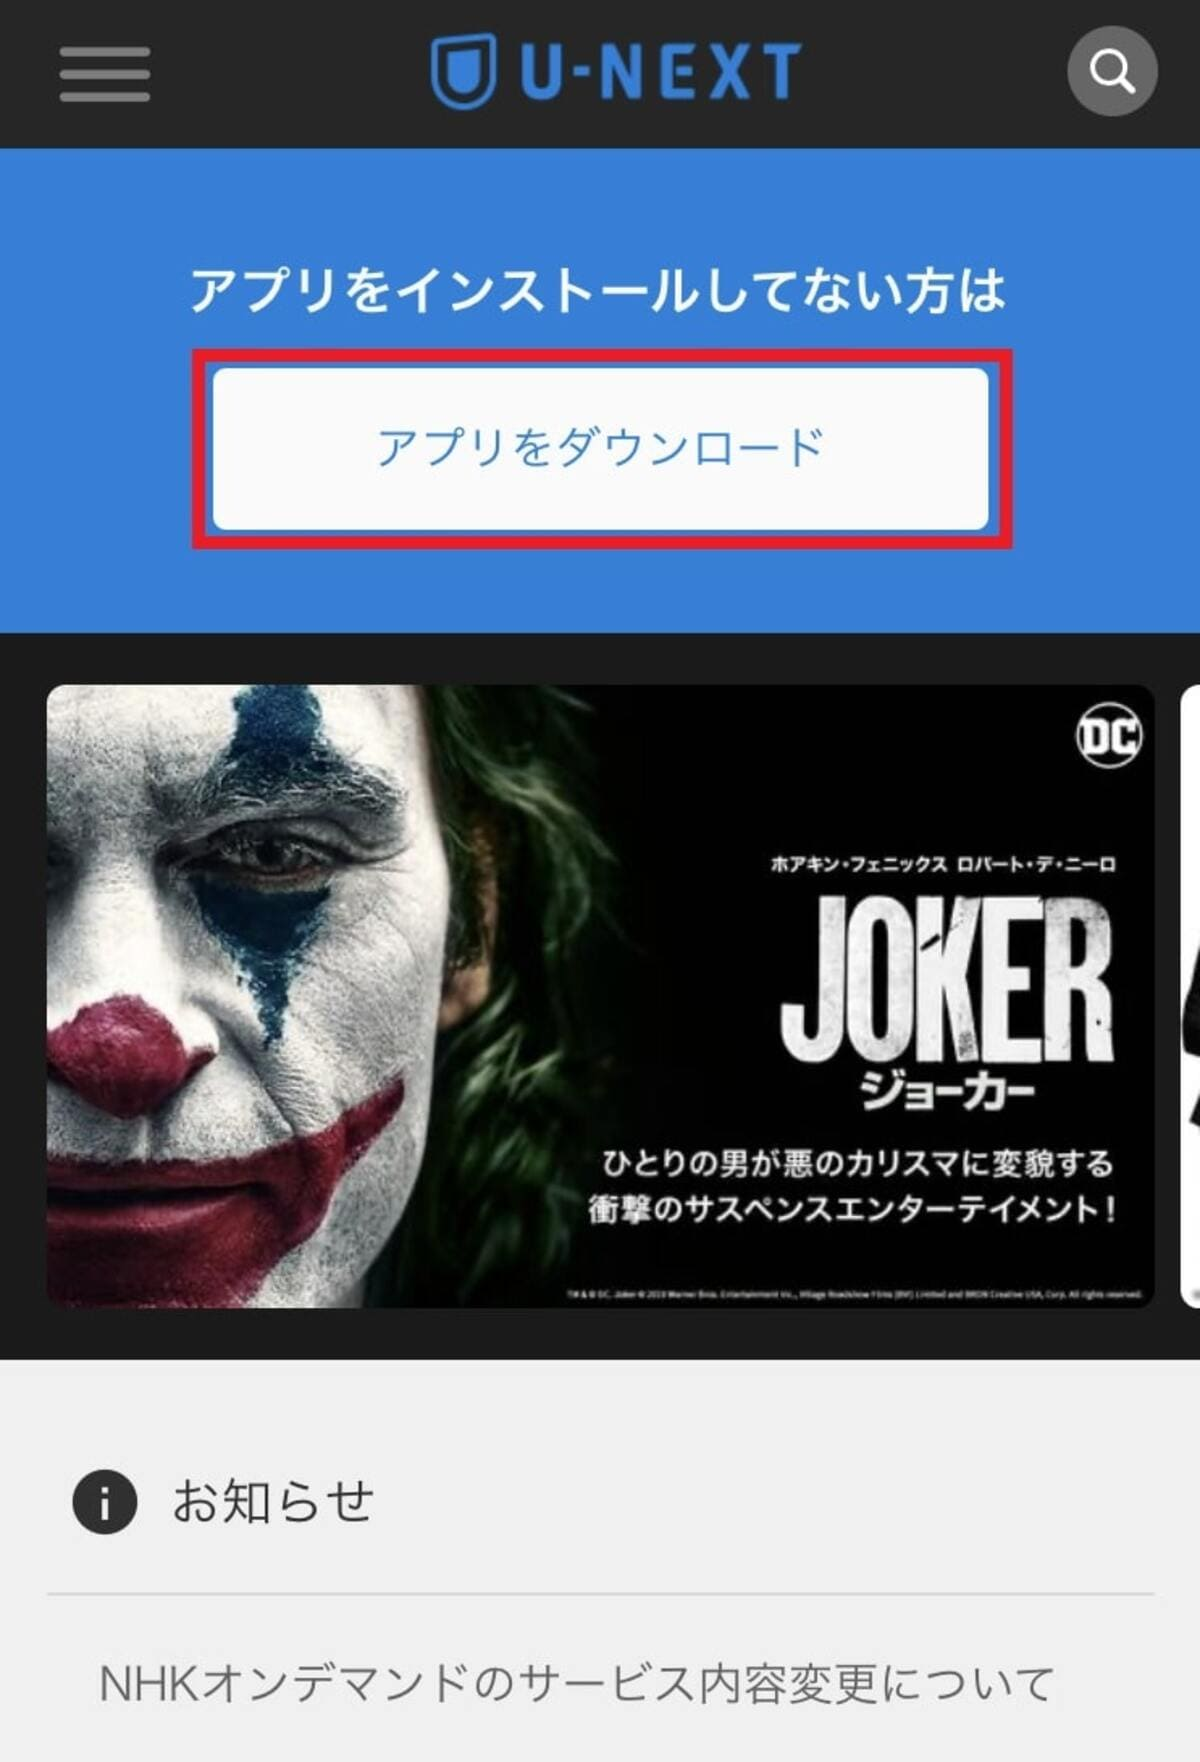 U-NEXTのアプリダウンロードの方法